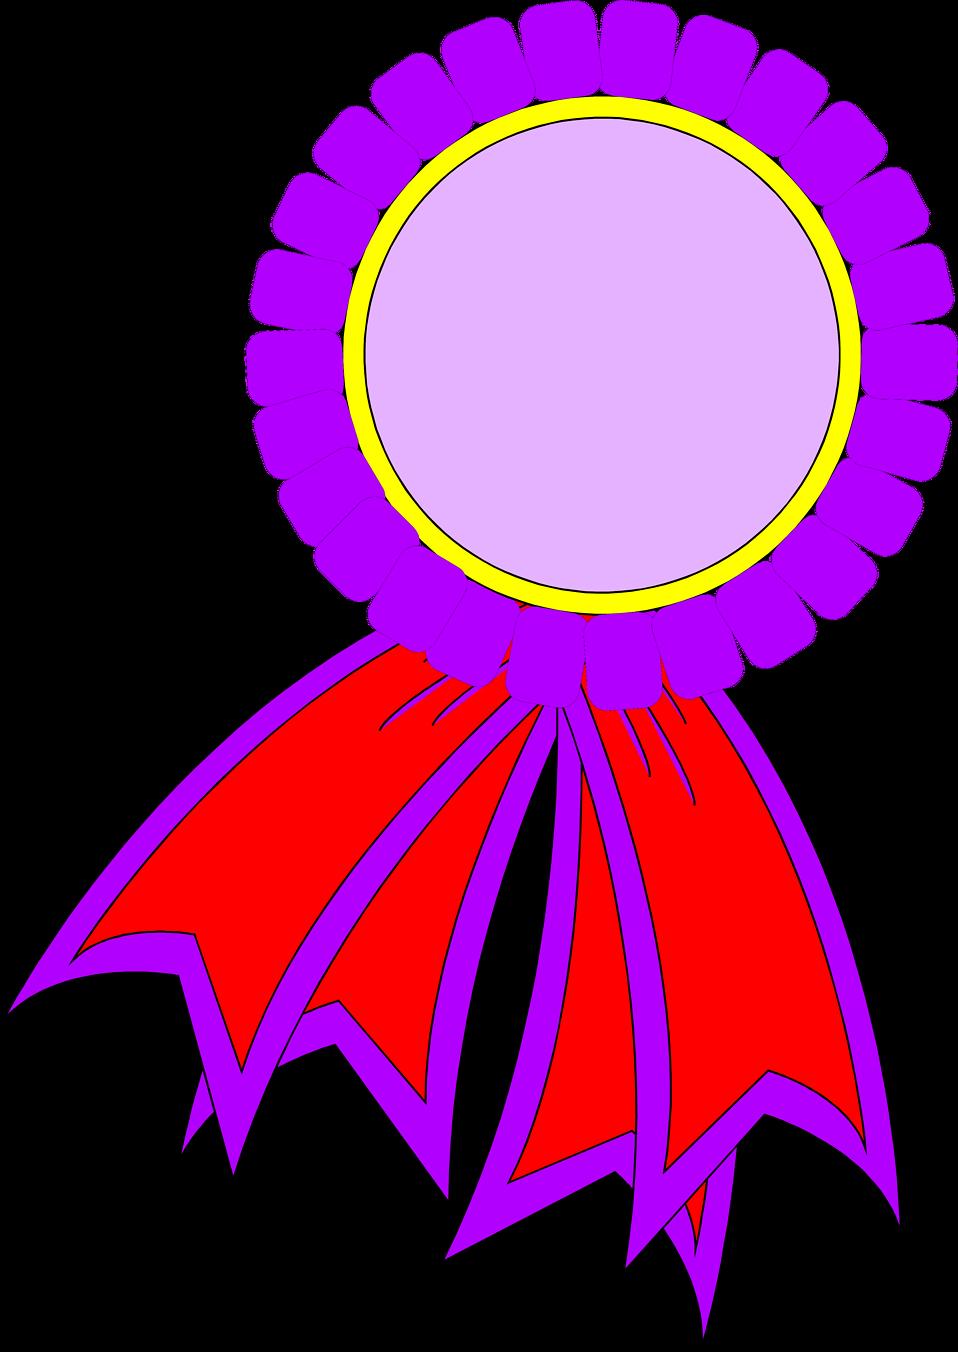 Award | Free Stock Photo | Illustrated blank prize ribbon ...